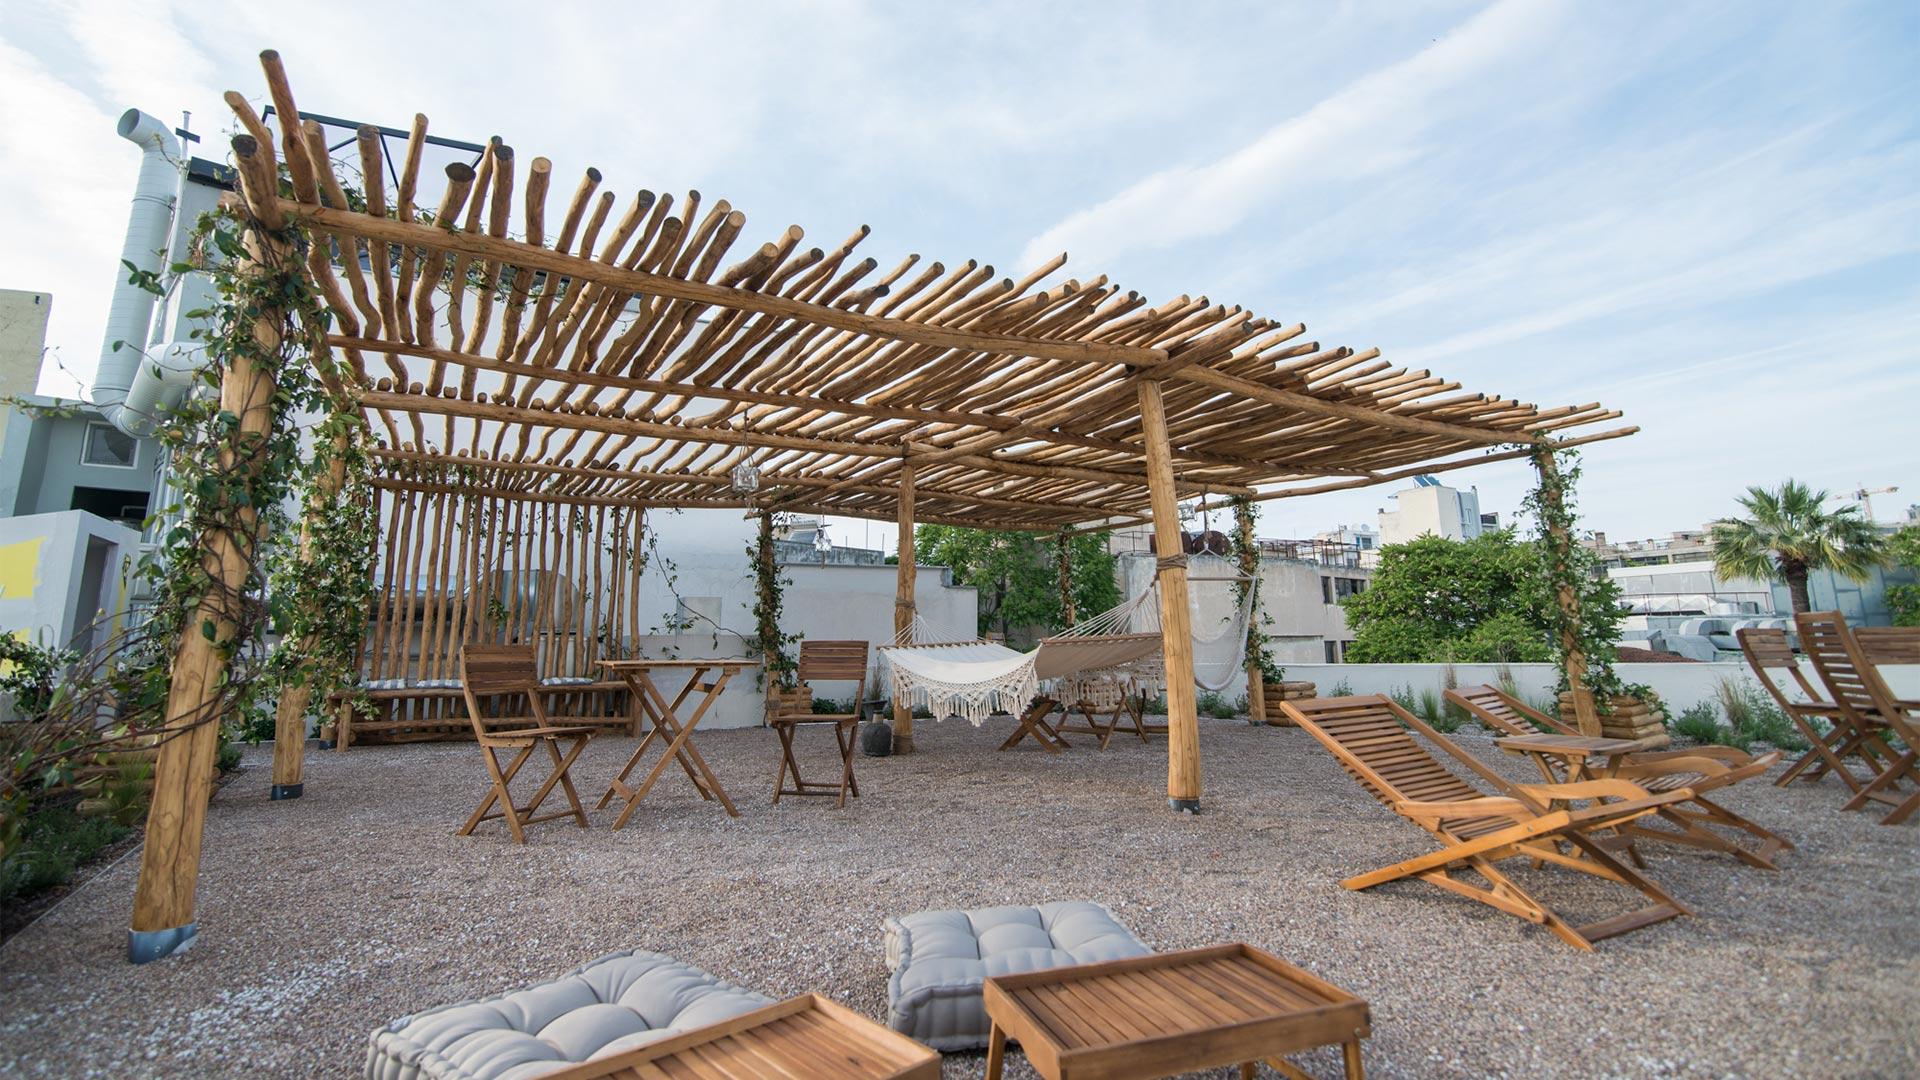 Ederlezi's roofgarden